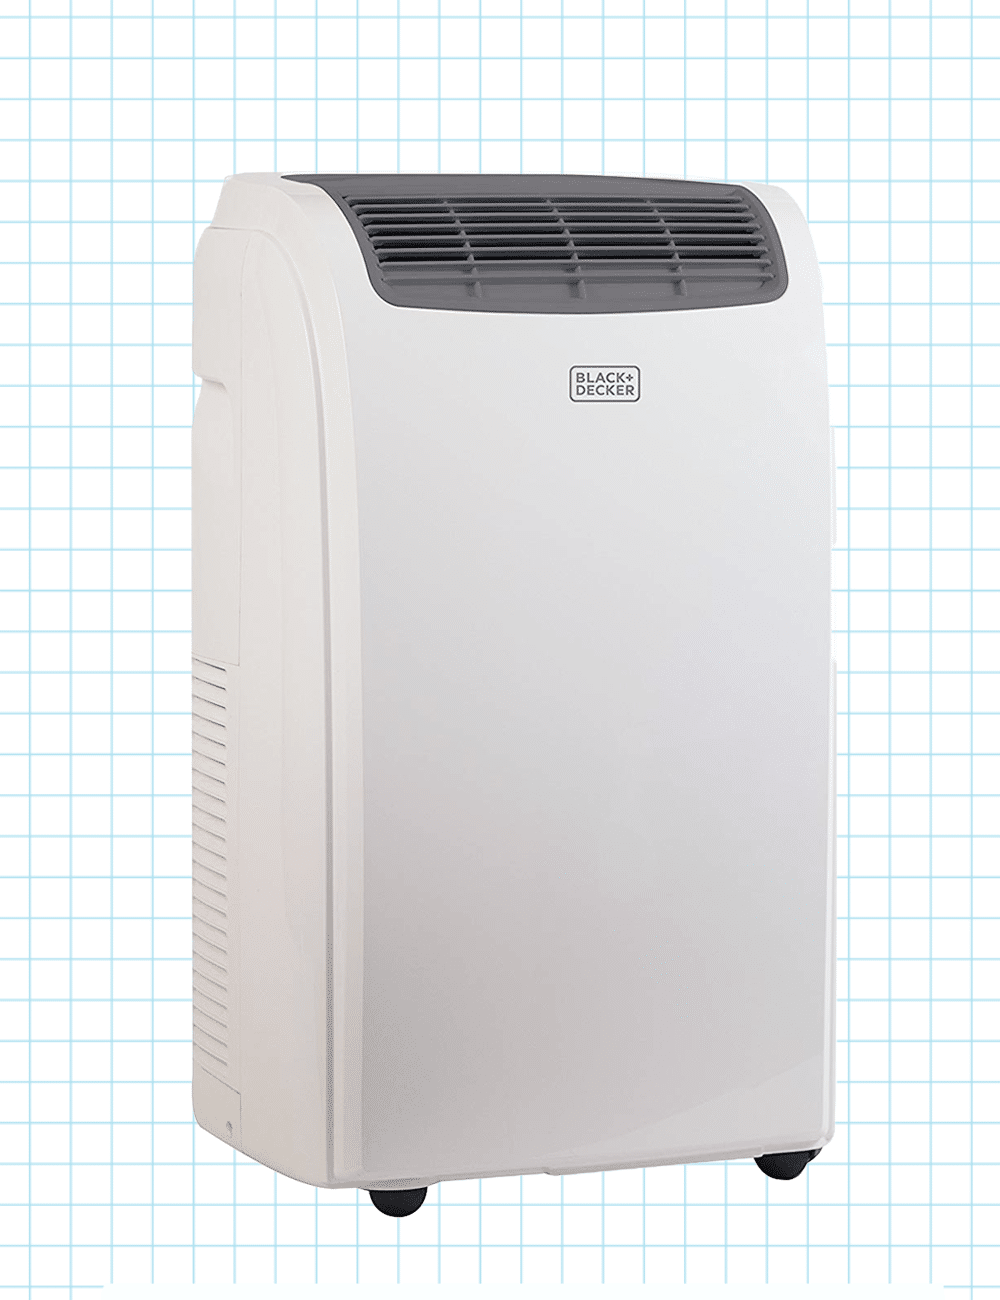 Cara Penggunaan AC Portable